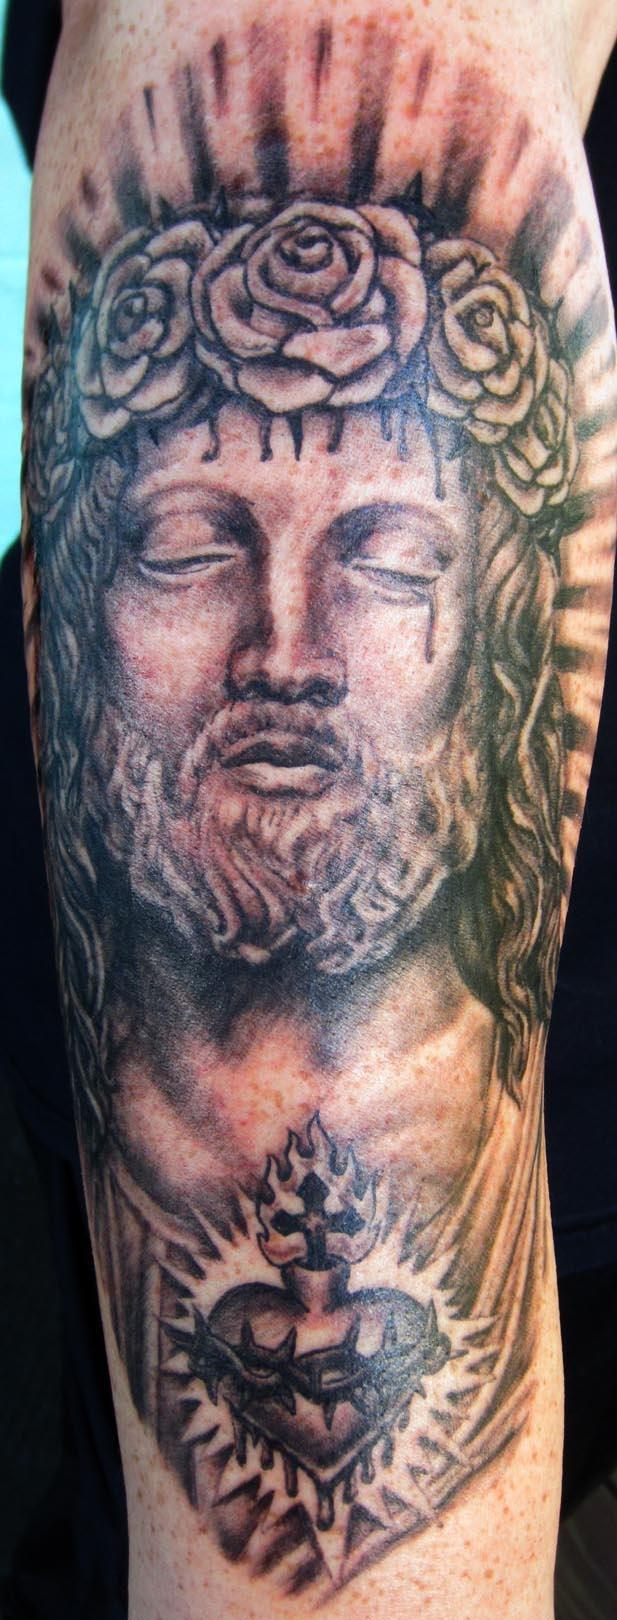 Tattoo ideas for men little jesus tattoo by lisa murphy ainstthegraintattoo  jesus